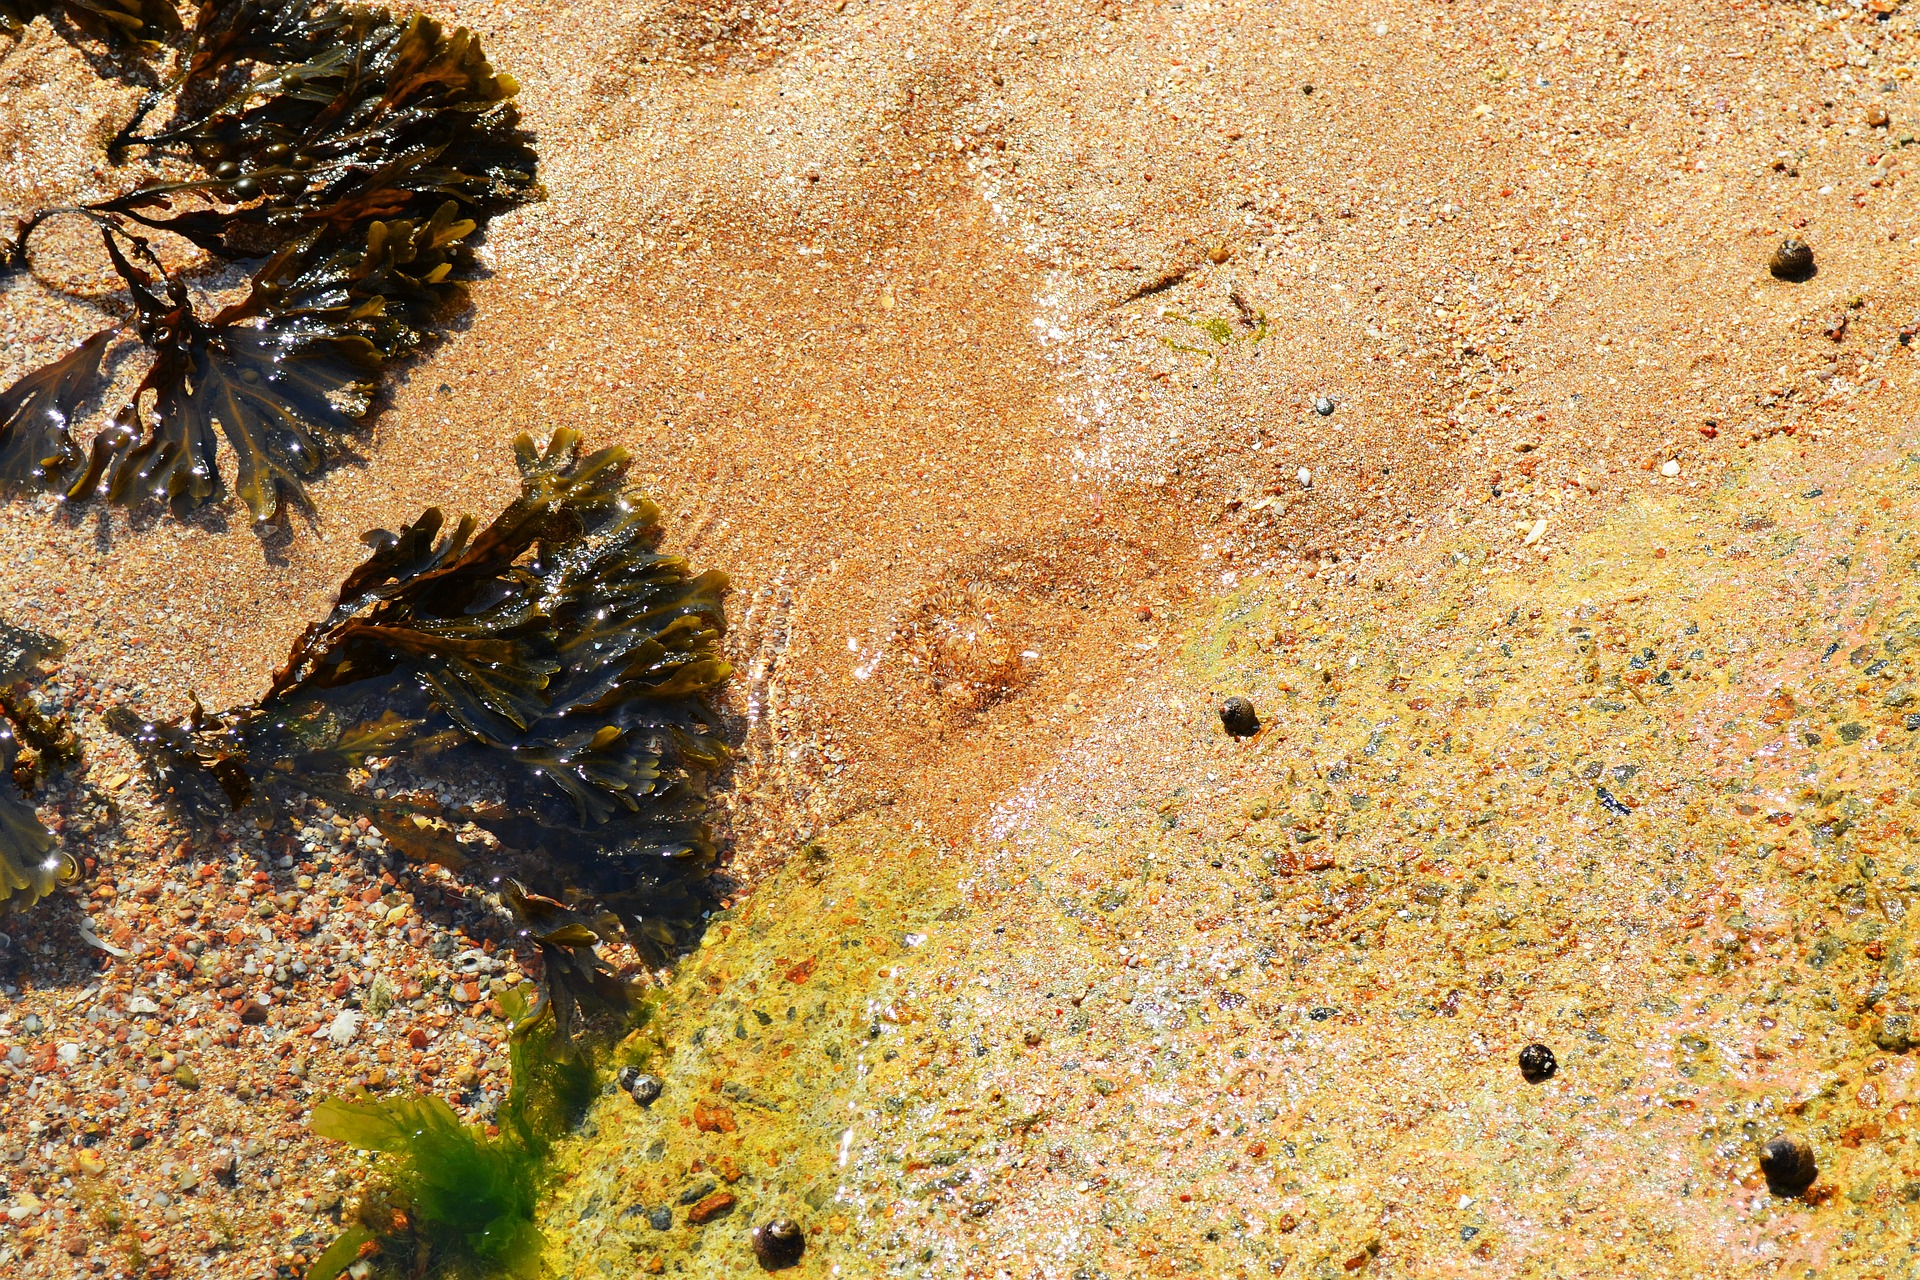 bladderwrack on the beach